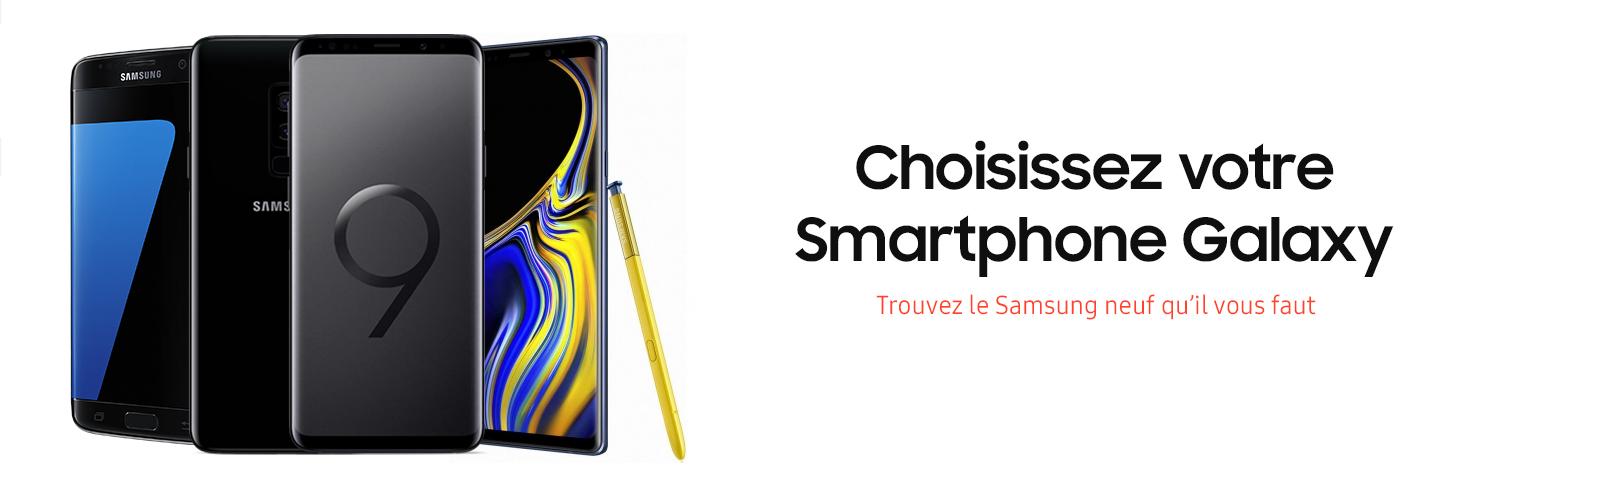 Smartphone samsung neuf galaxy s 7 8 9 note ynotek france garantie